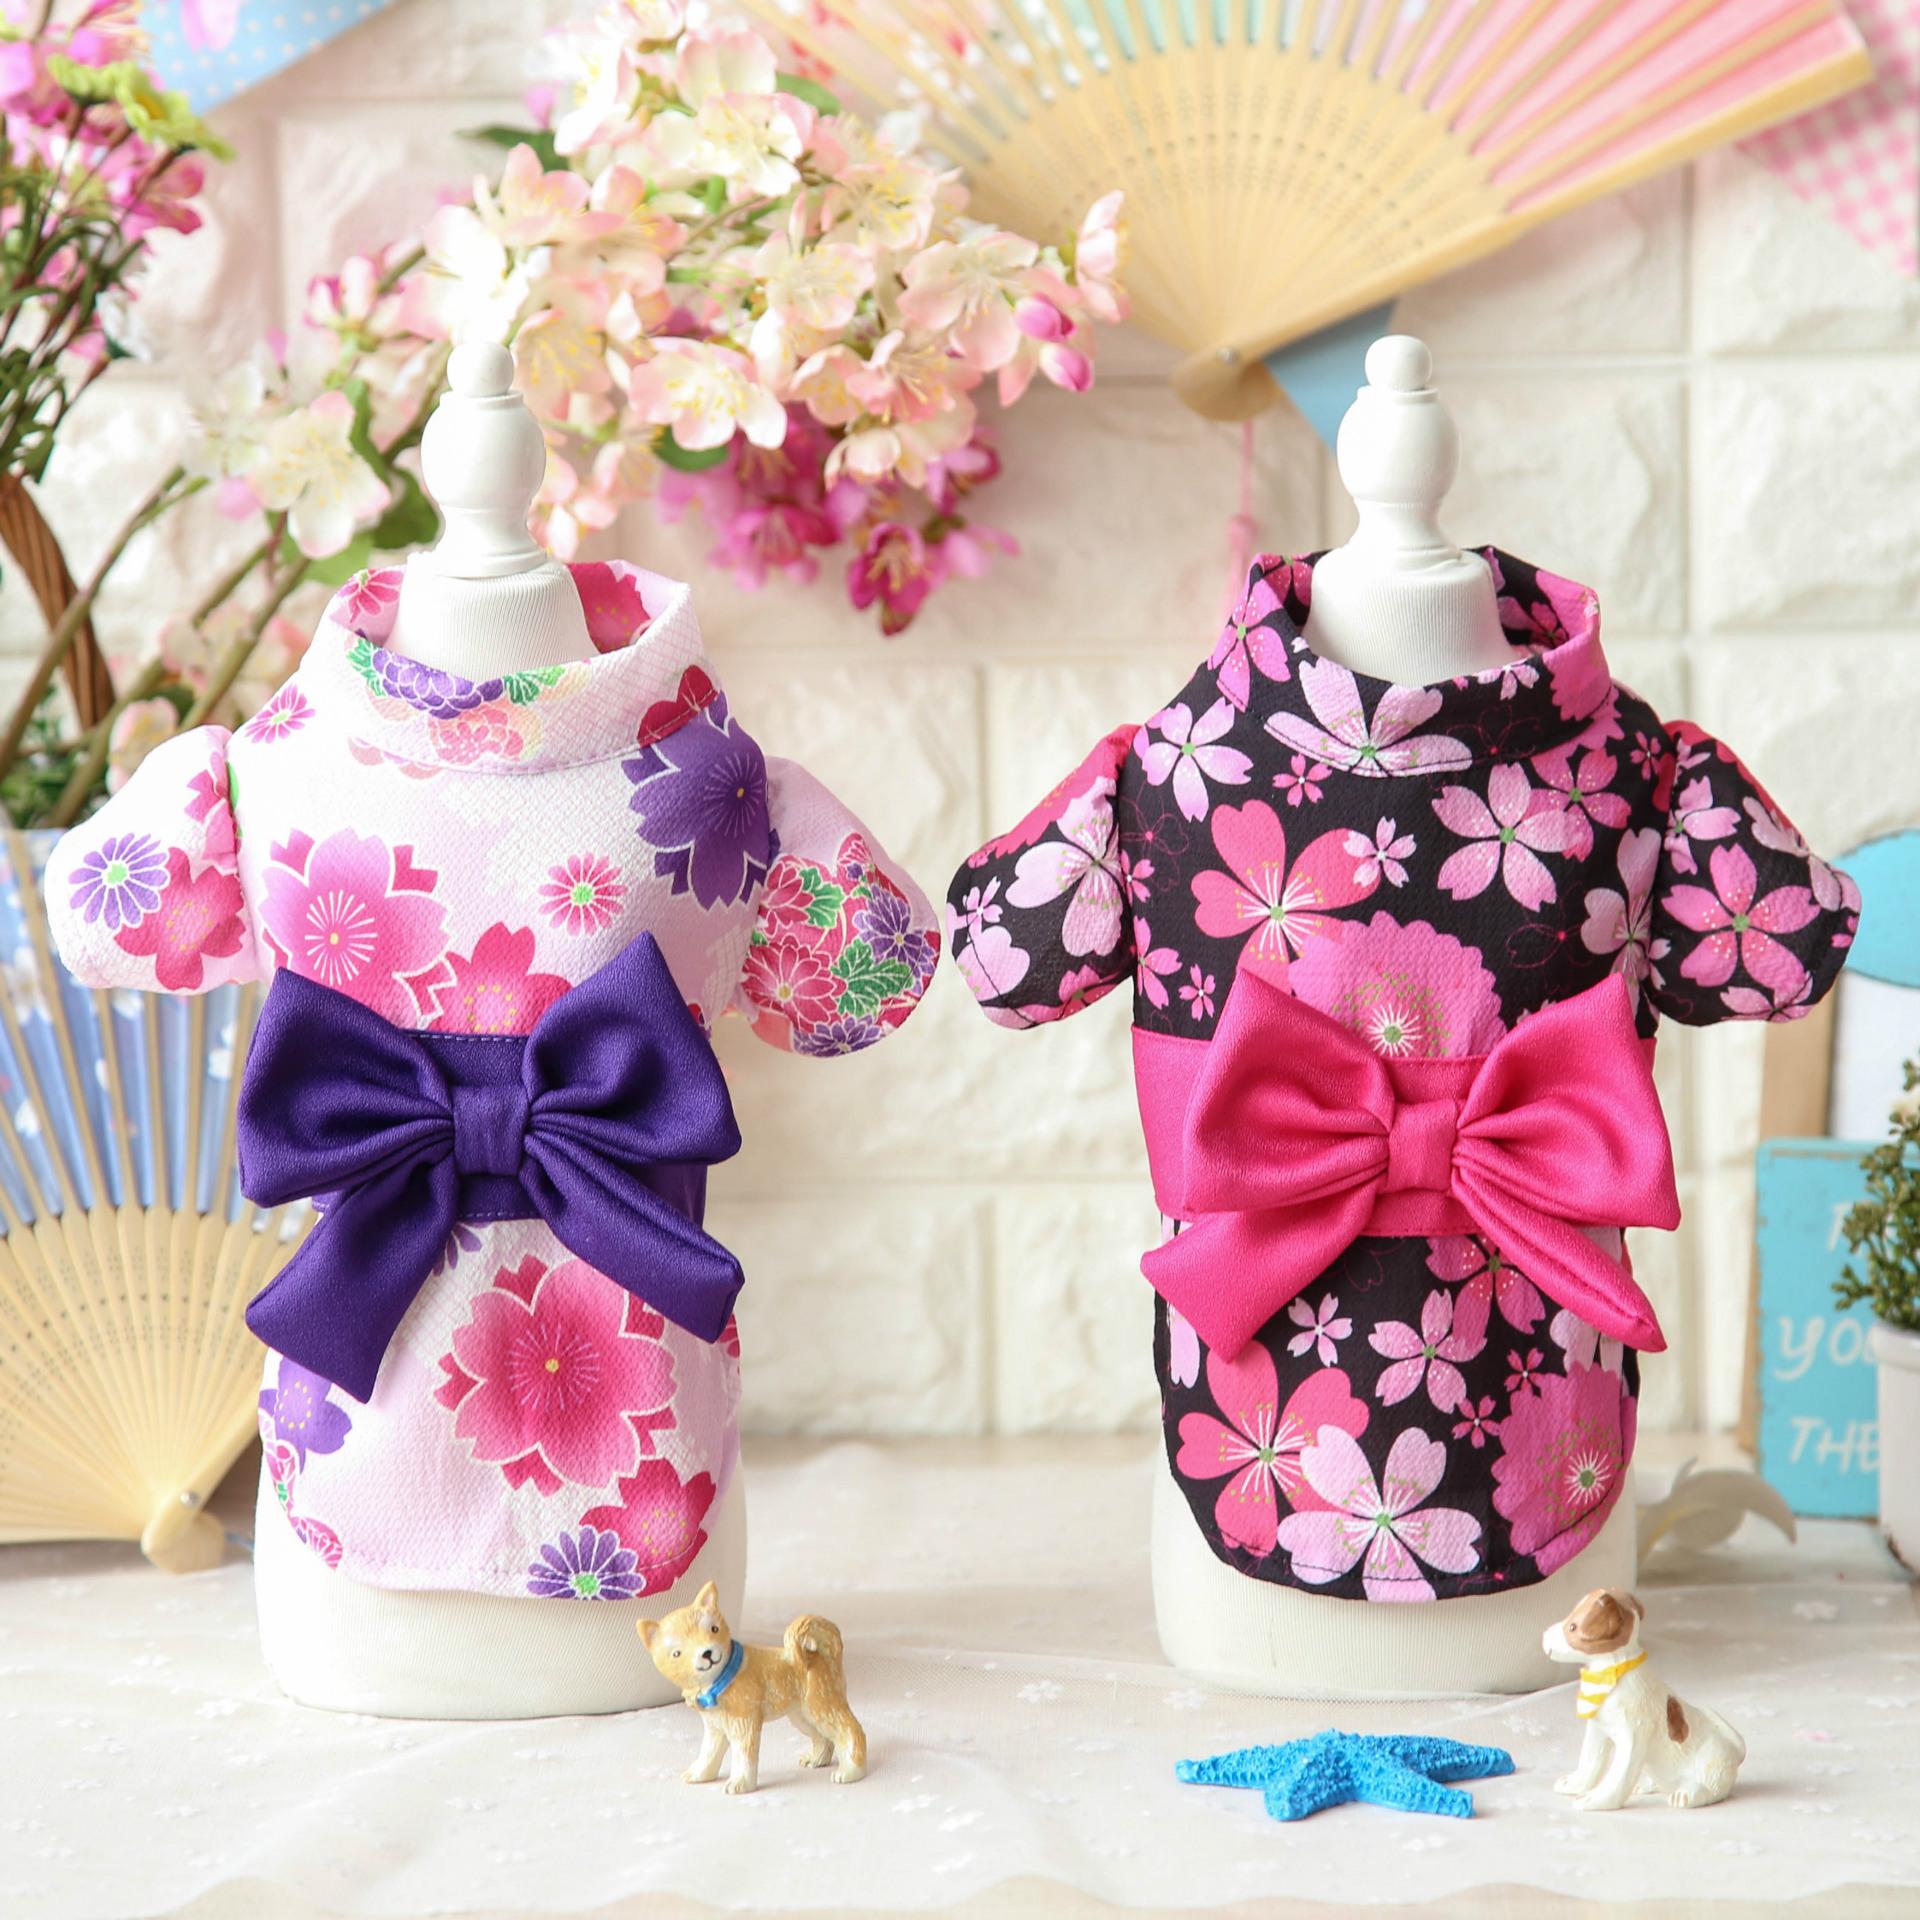 Petstyle春夏新品 日式樱花丸菊和服 宠物狗狗衣服 和风浴衣